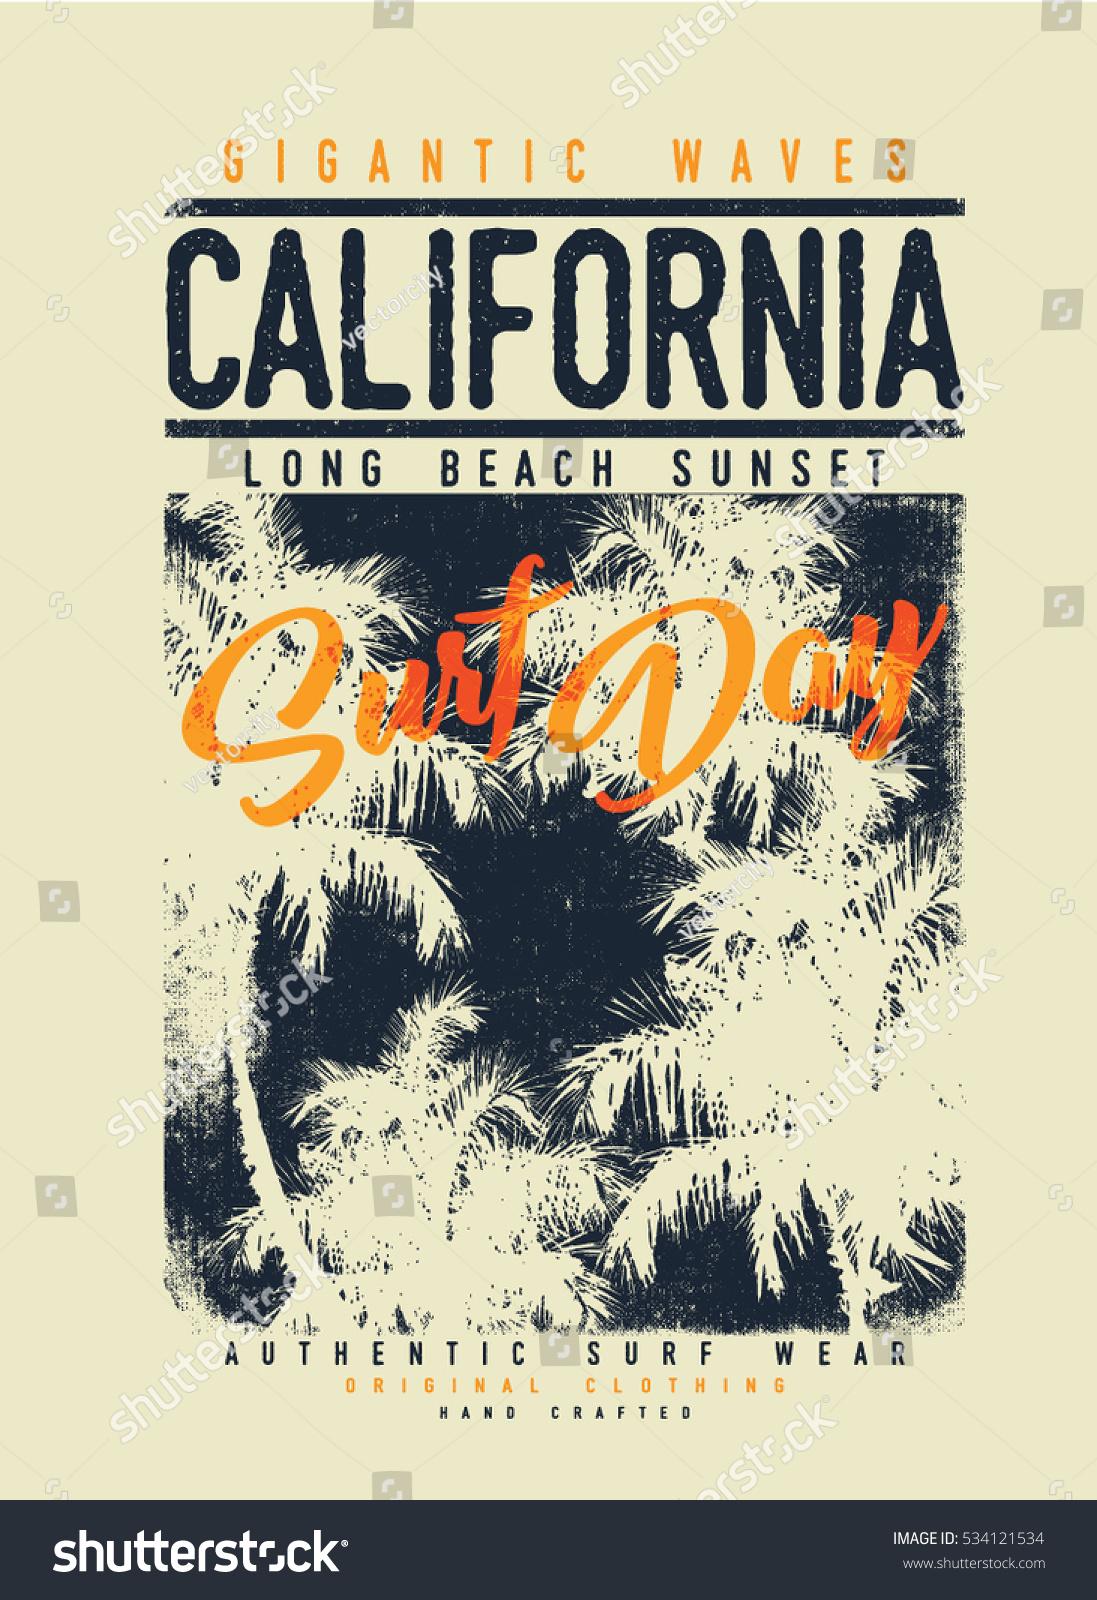 Surf graphic tshirt printing surfing design stock vector for Graphic design t shirt printing